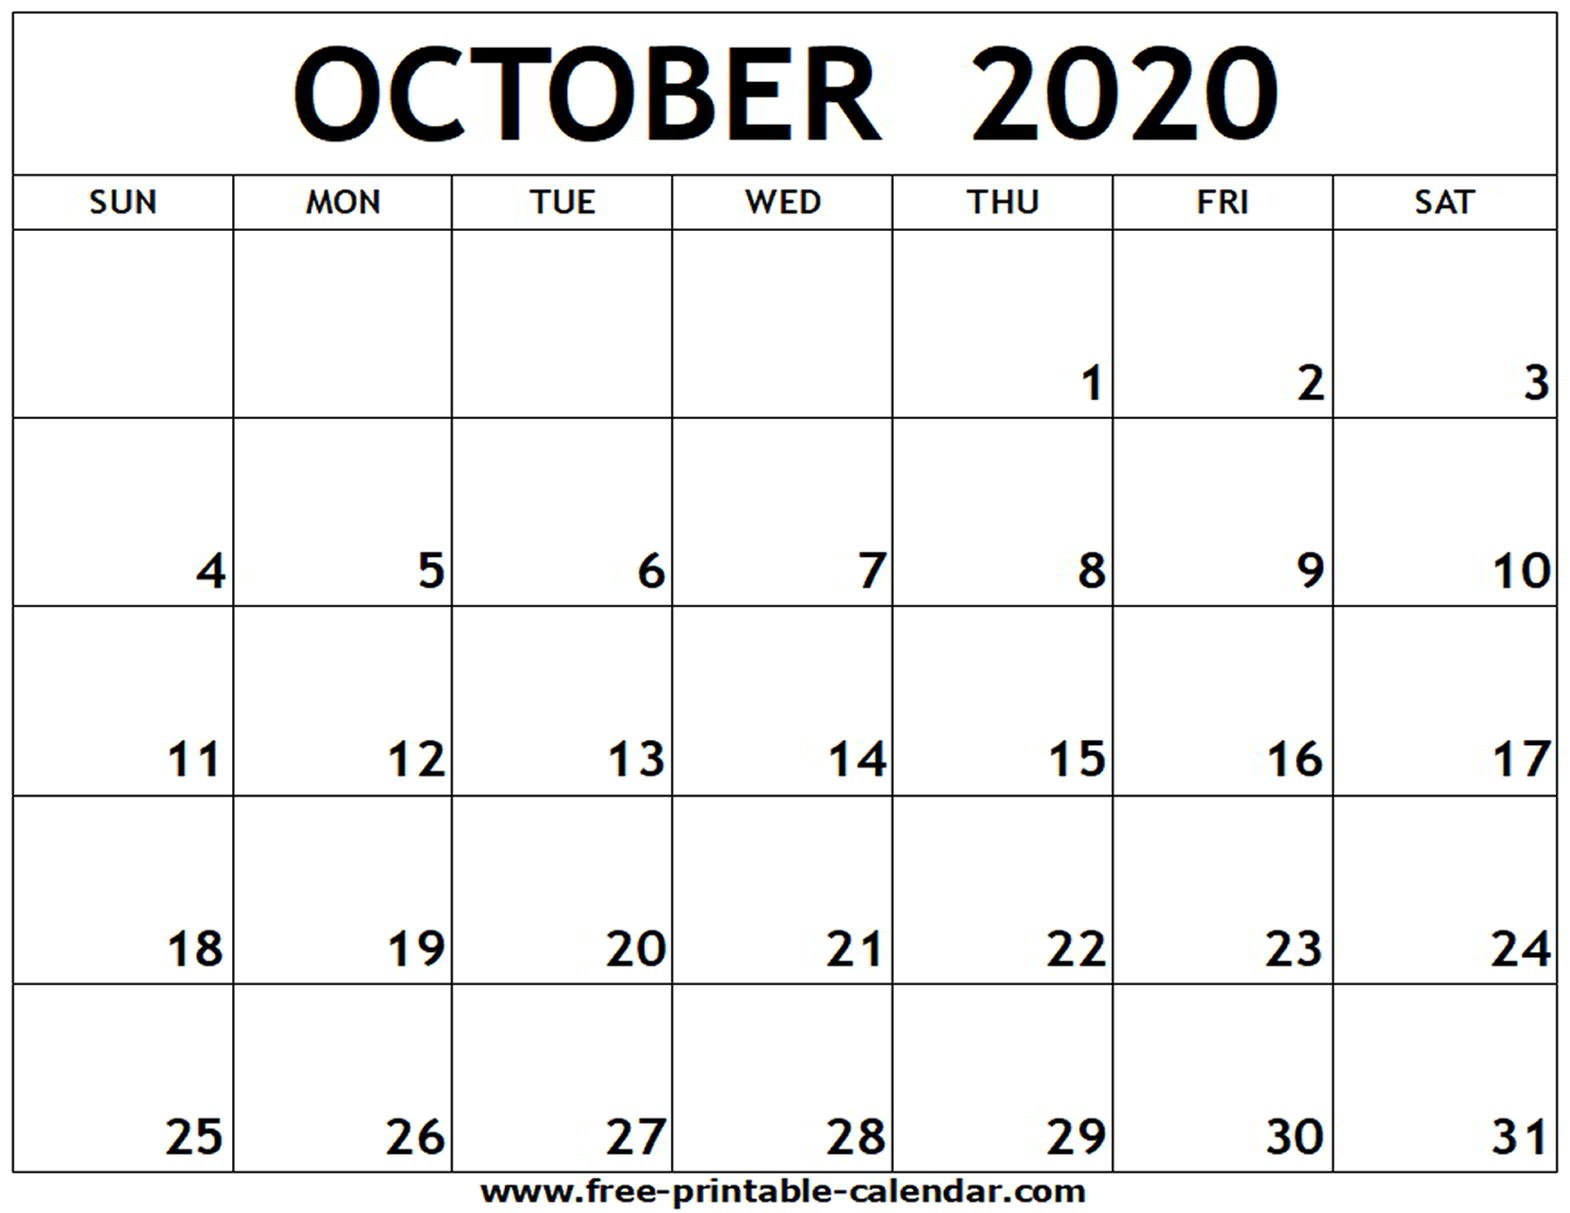 October 2020 Calendar Printable October 2020 Printable Calendar Free Printable Calendar